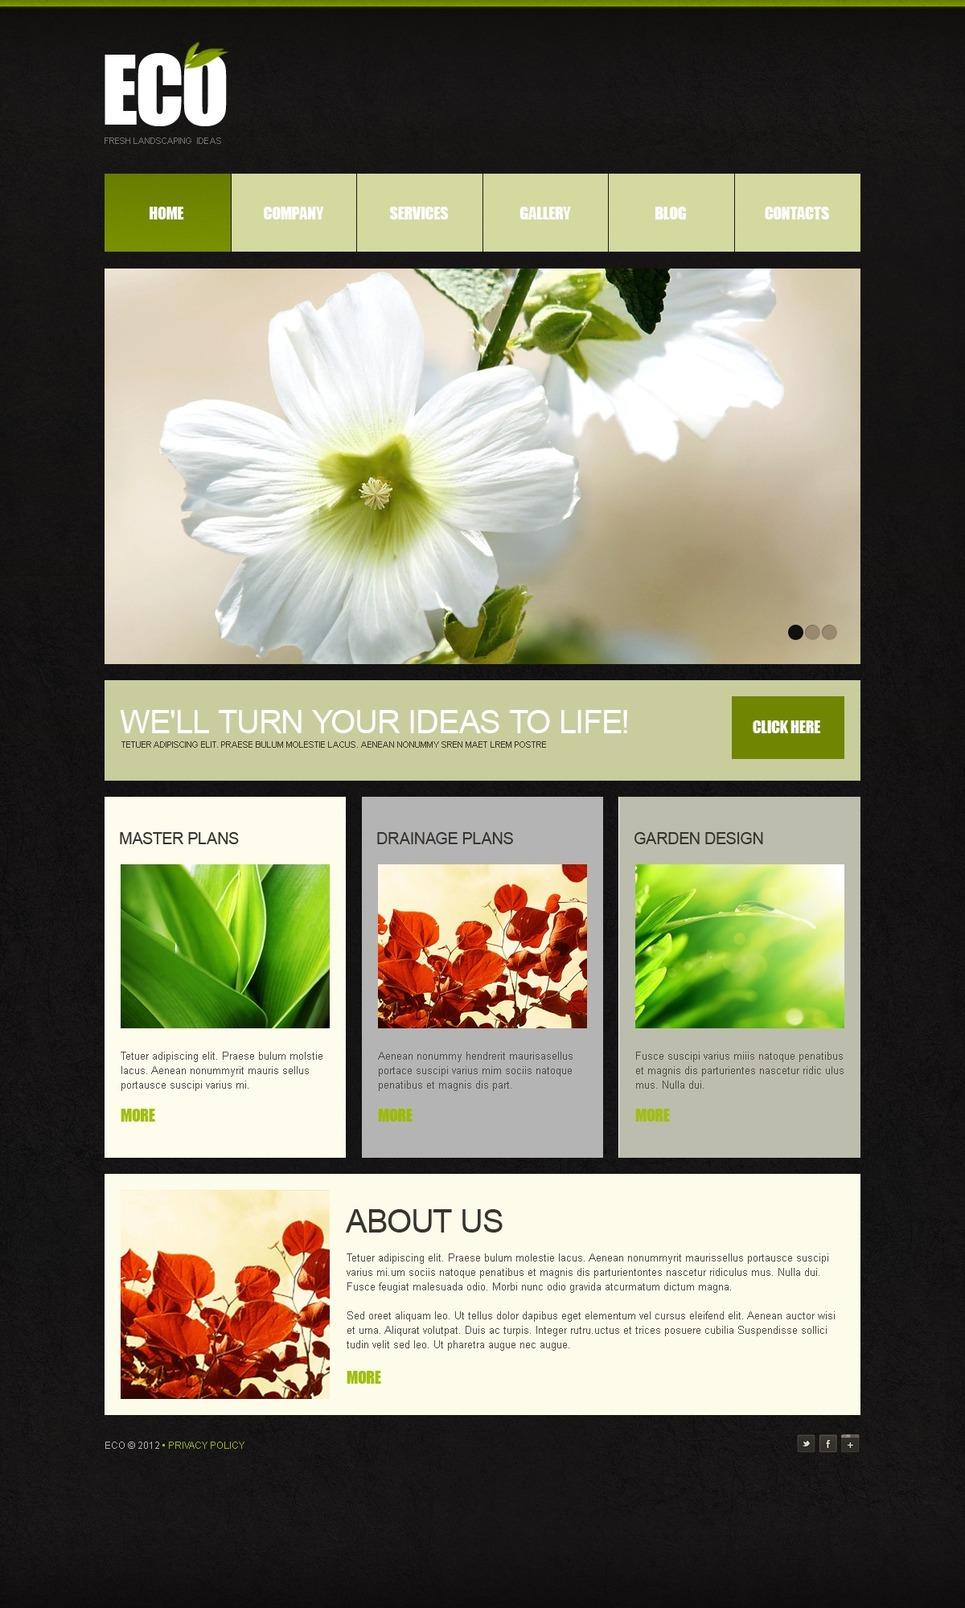 Landscape design joomla template 38449 for Garden design questions